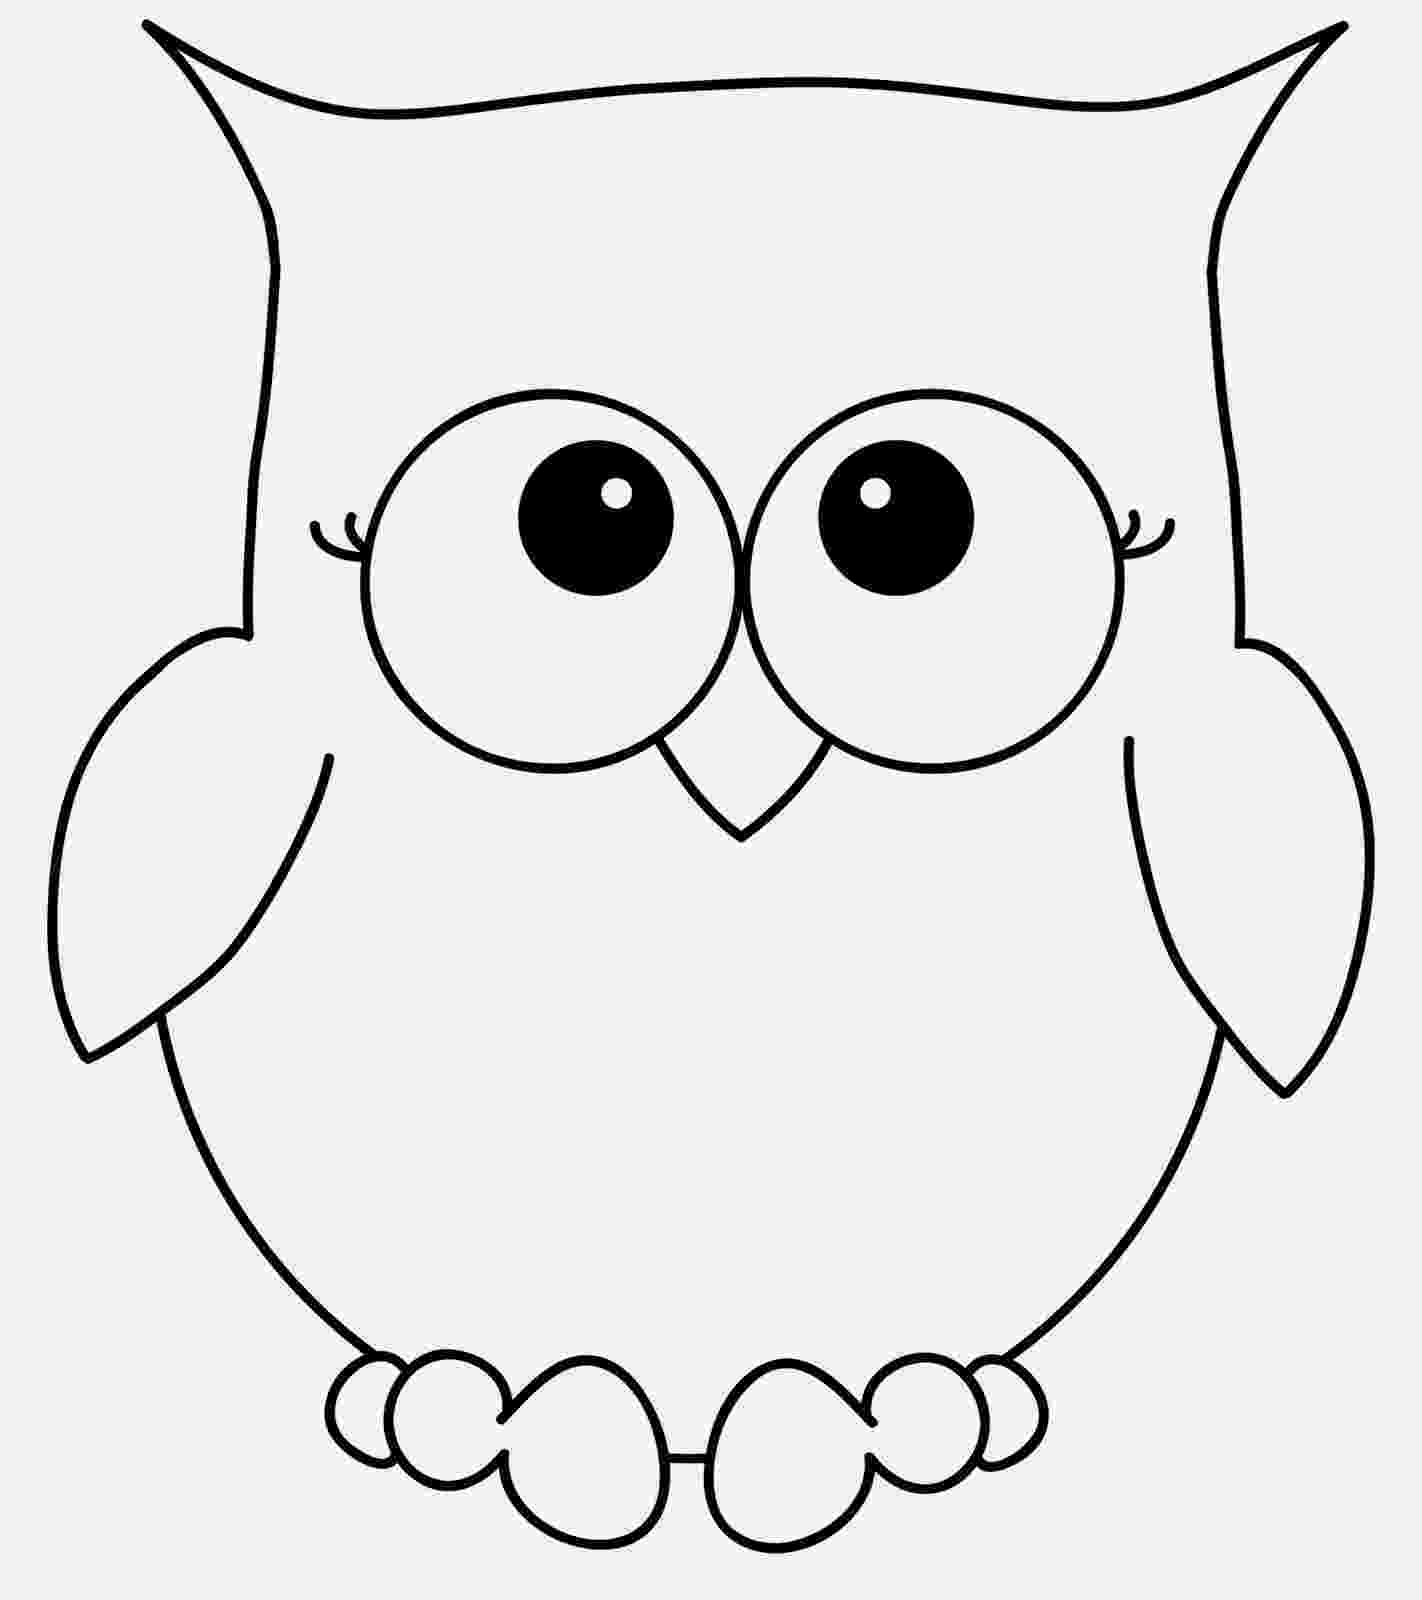 printable owl colouring selimut ku cute lil39 owl colouring printable owl